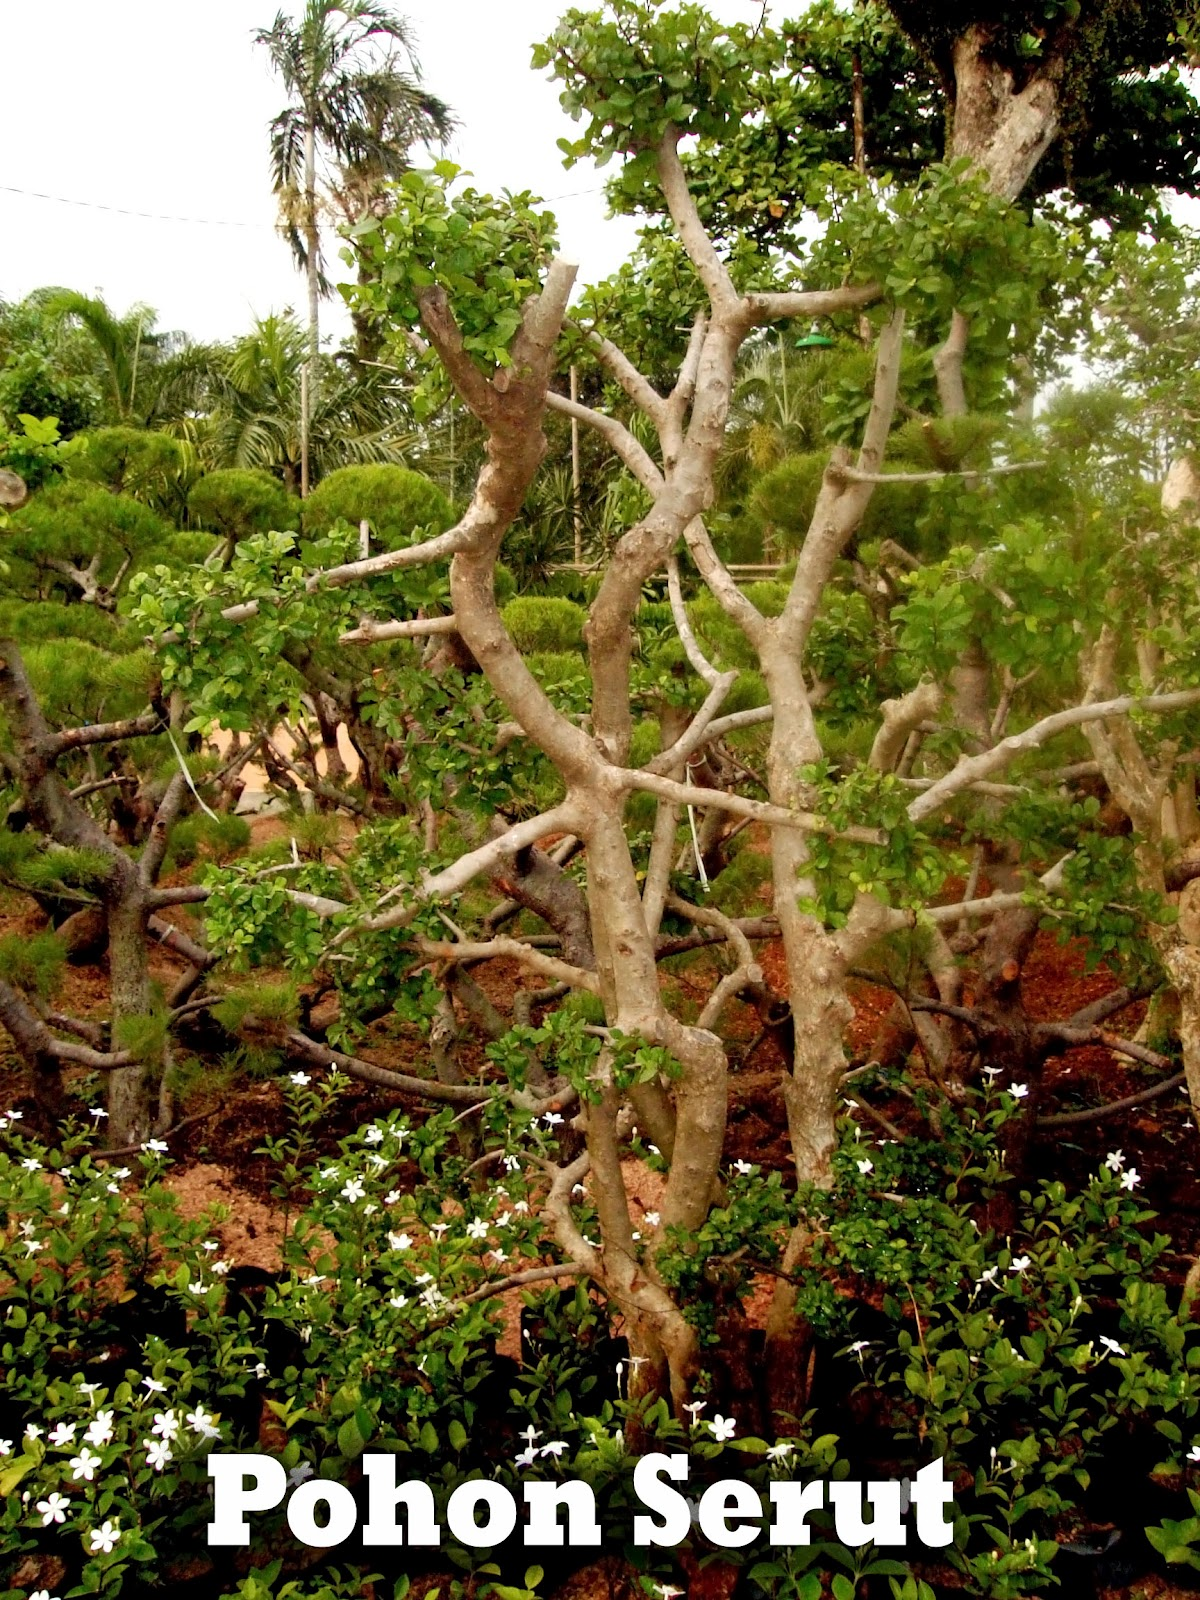 pohon serut besar jual tanaman hias